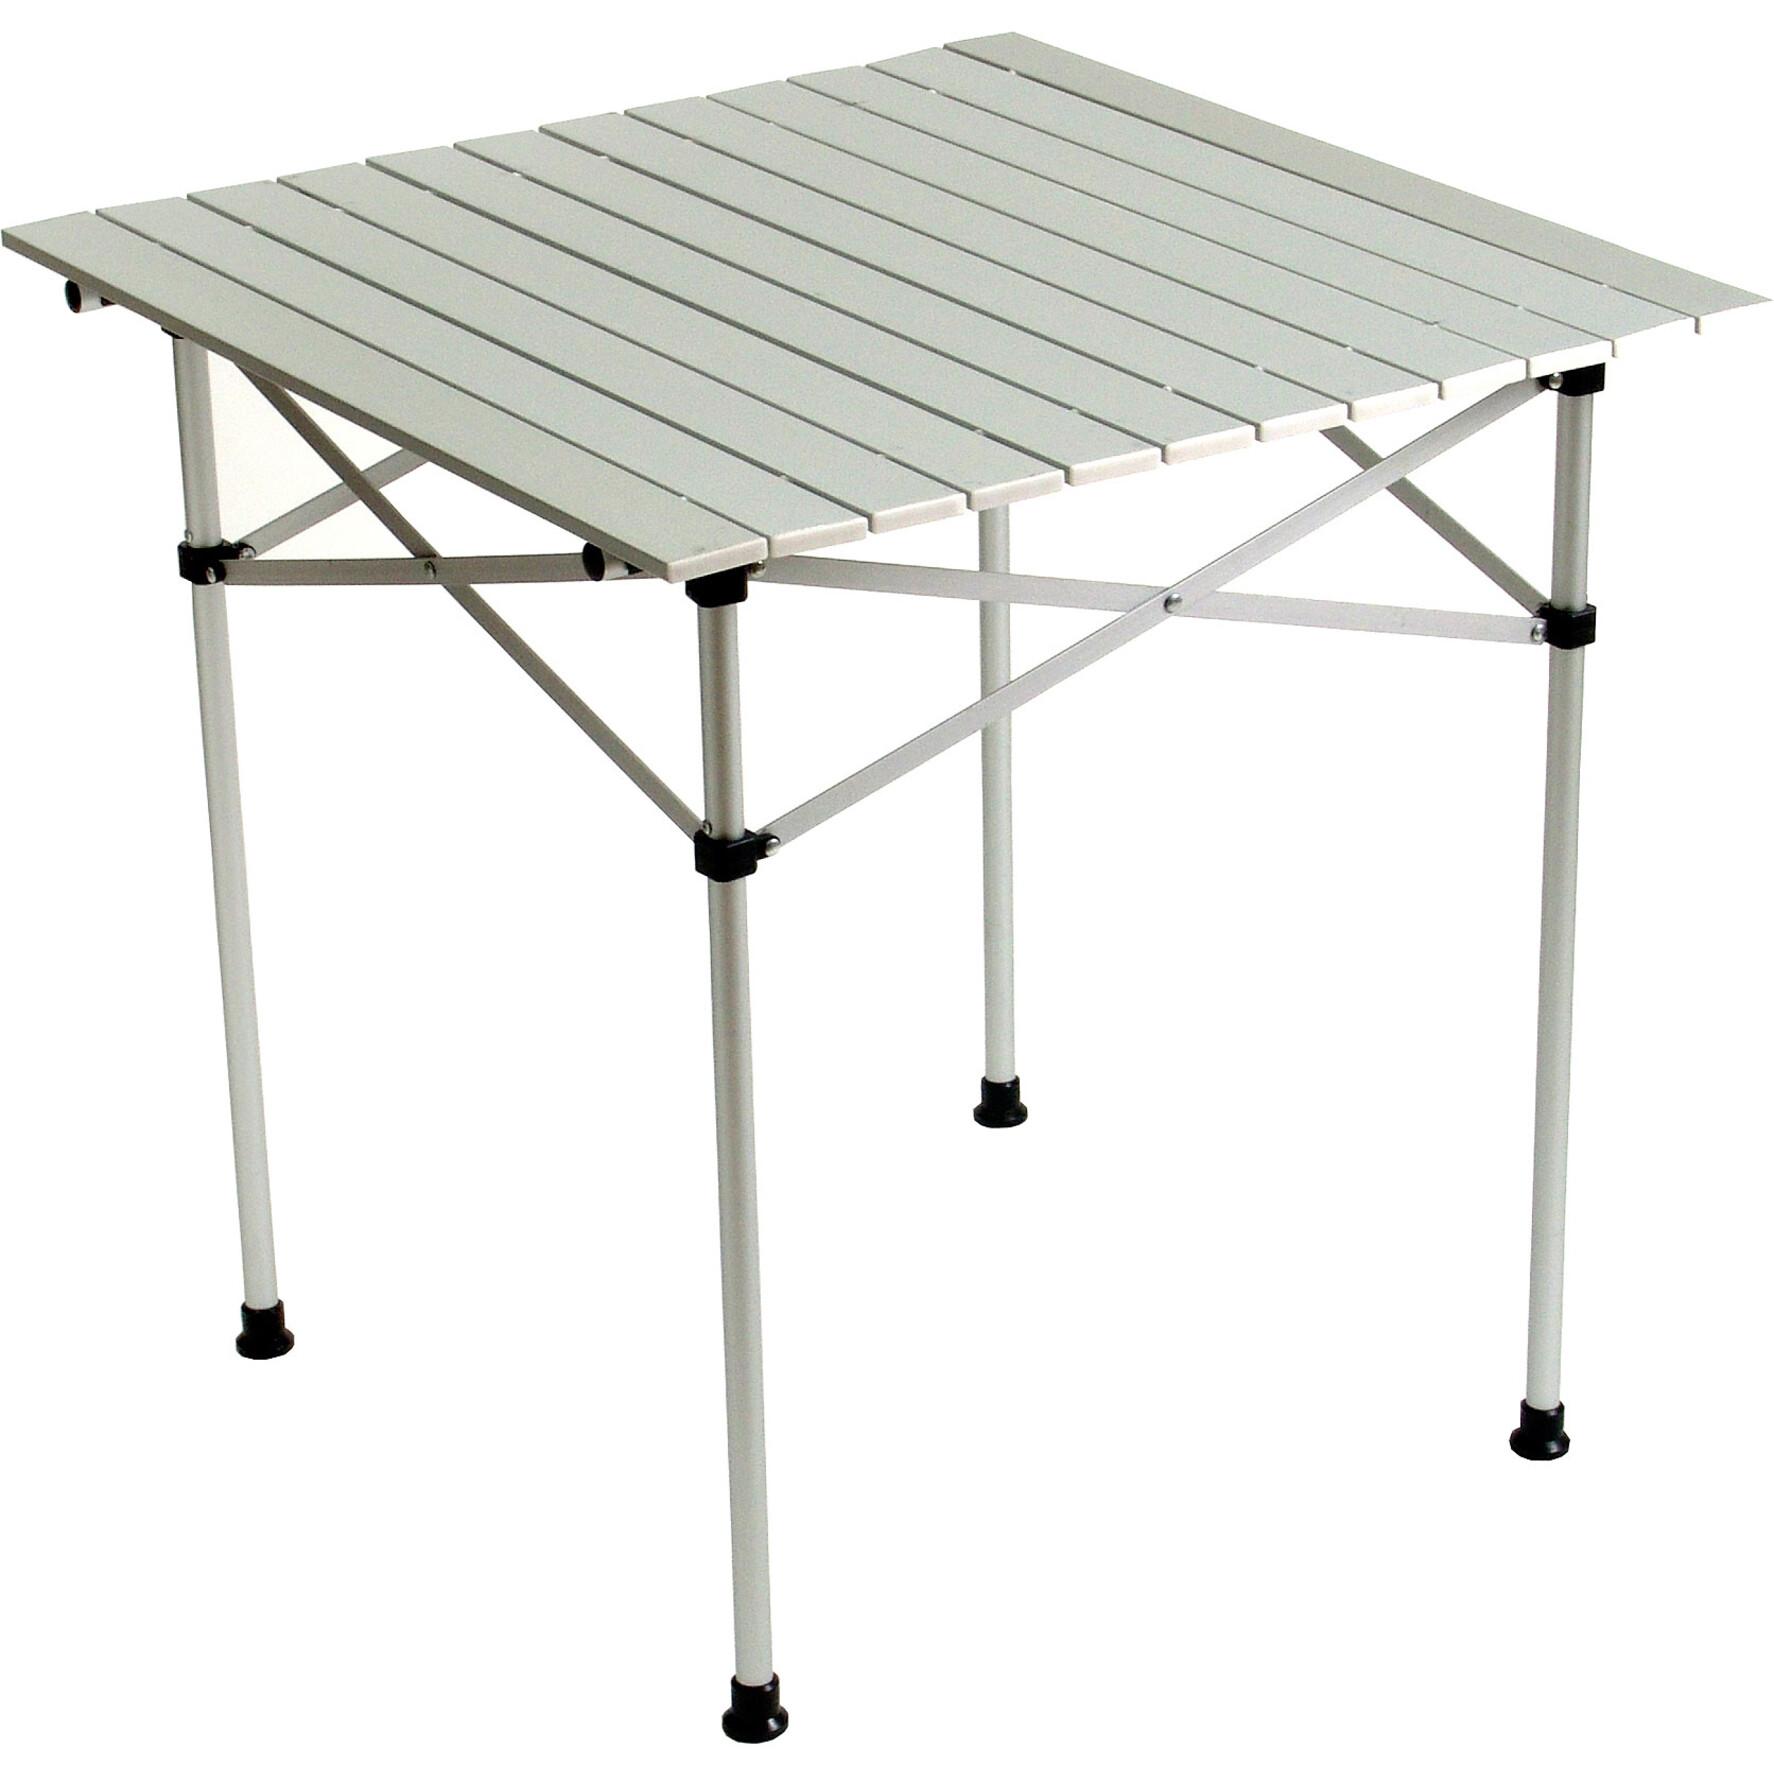 Relags travelchair mesa plegable peque a - Mesa plegable pequena ...